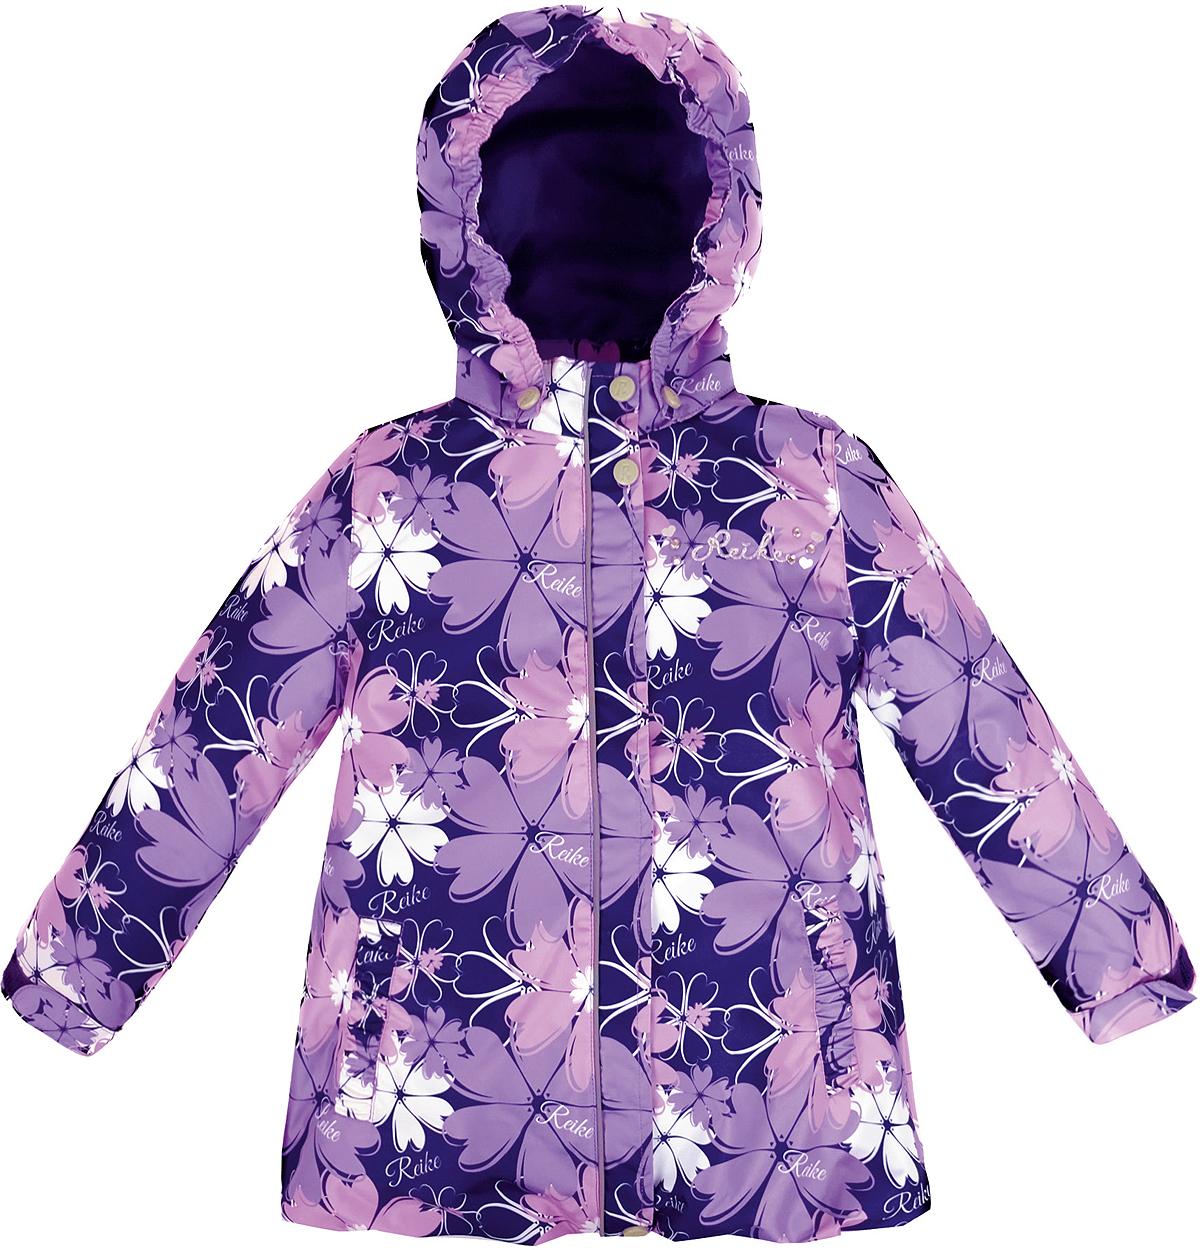 Плащ36 946 335_Cosmei violet